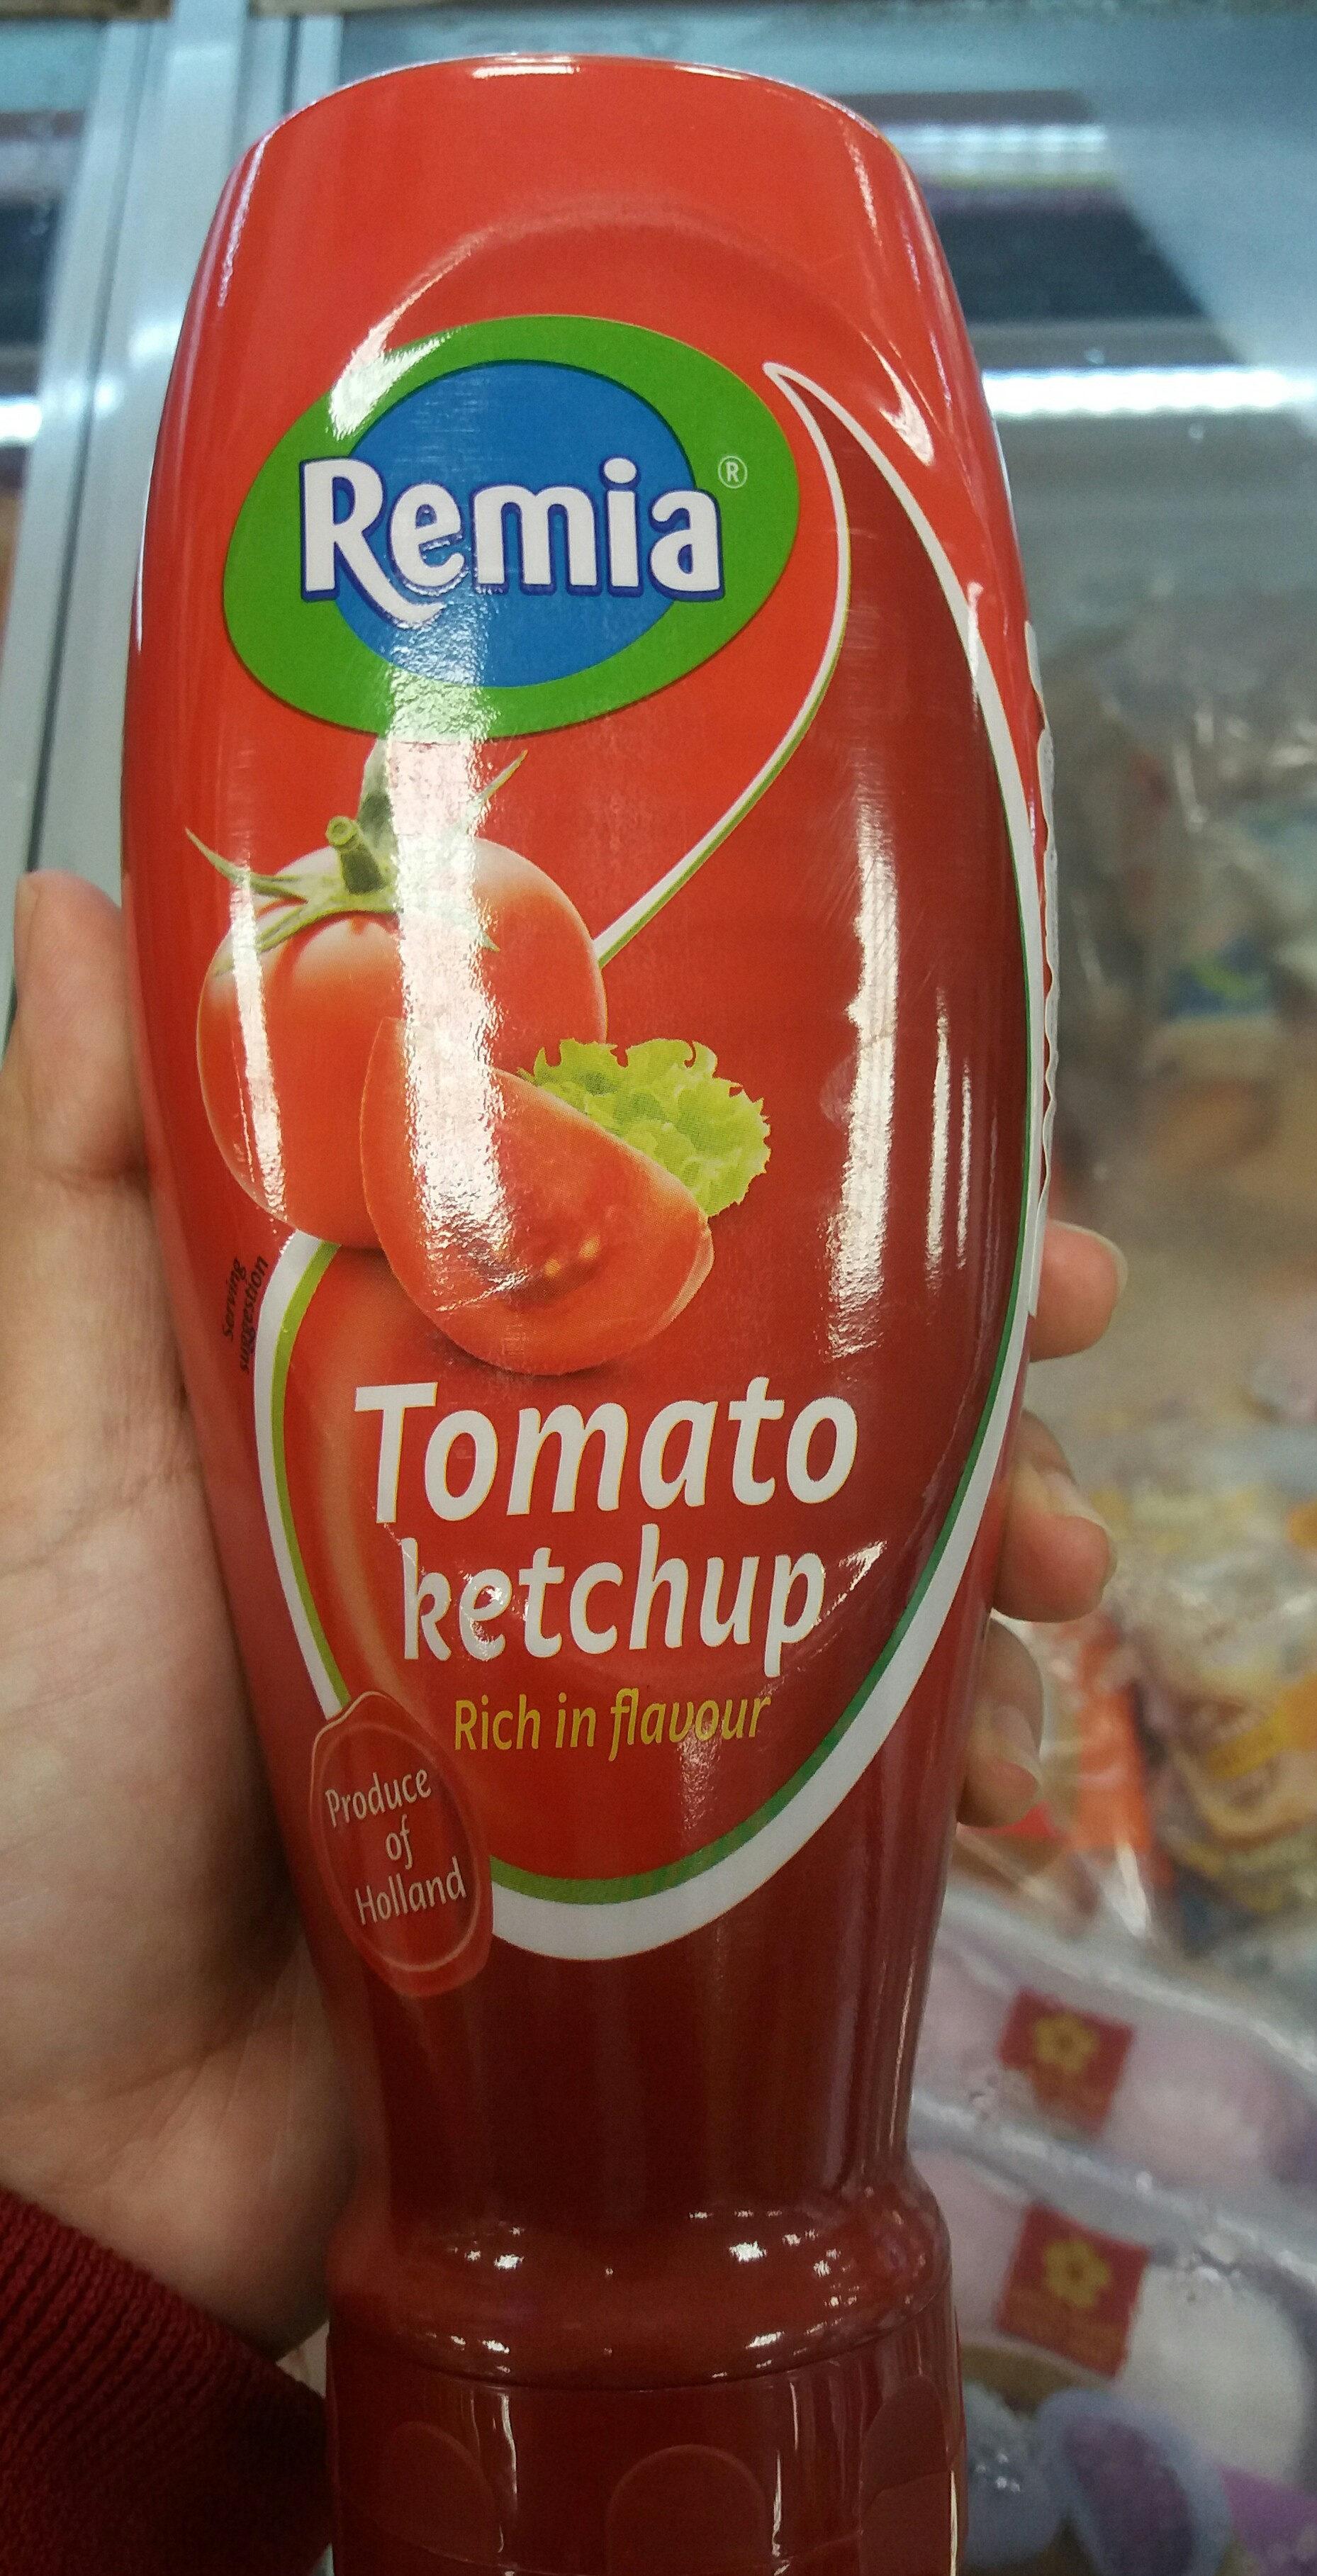 tomato ketchup - Sản phẩm - en